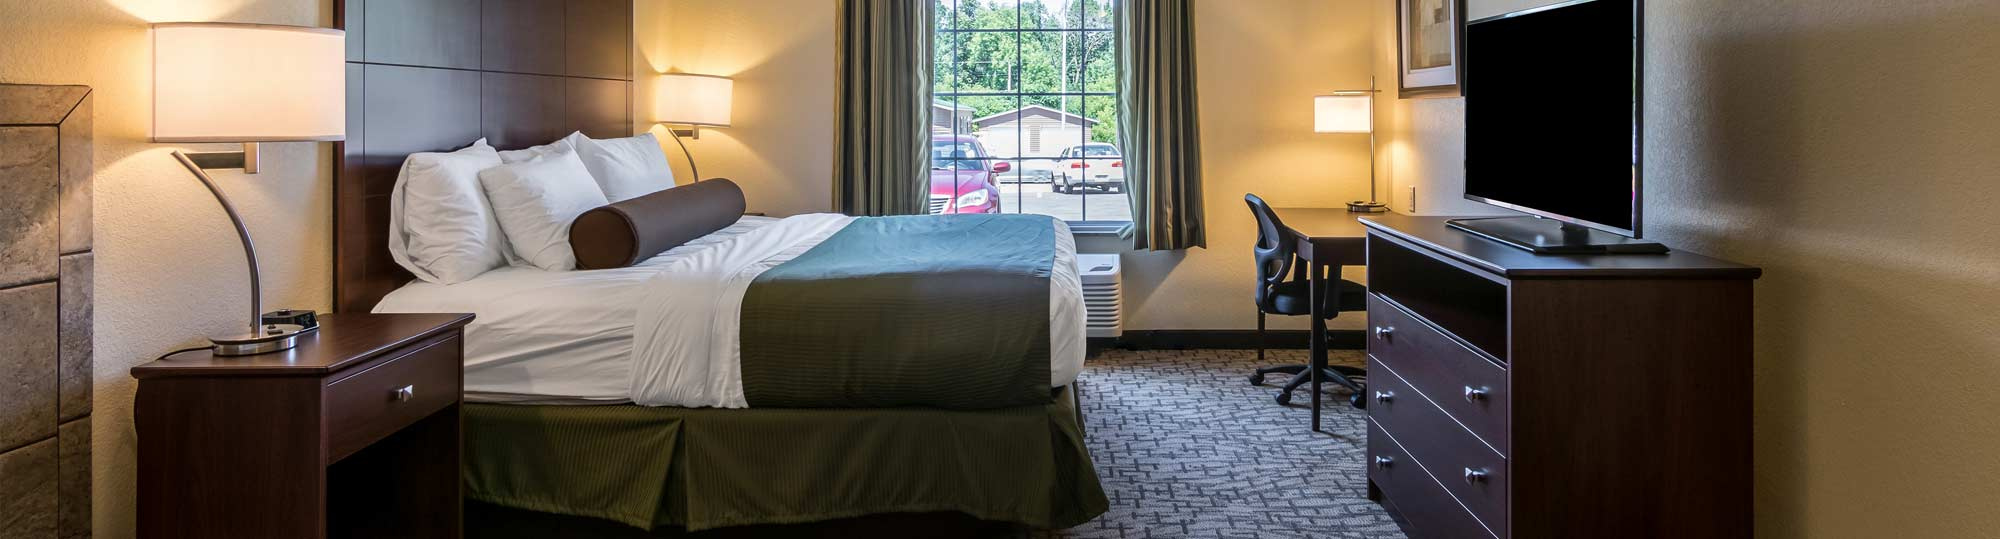 Cobblestone Inn and Suites Barron